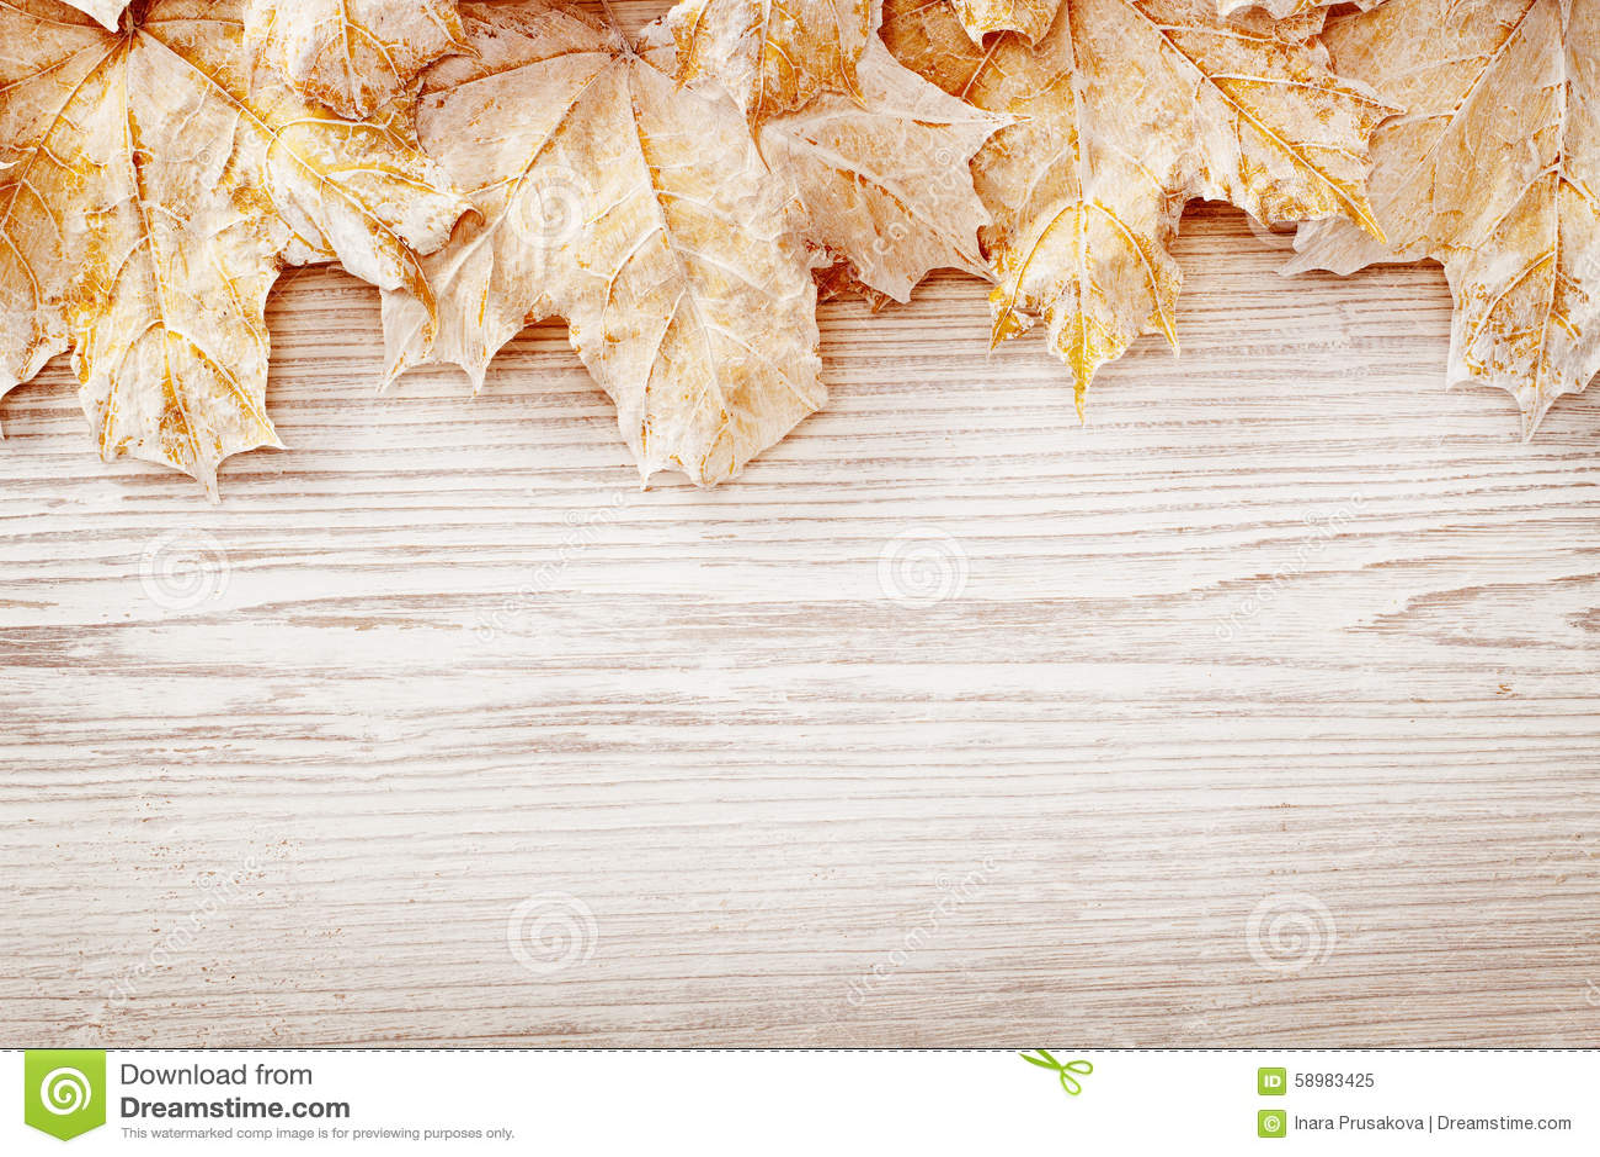 Feuilles blanches de fond en bois, Autumn Wooden Grain Board Texture